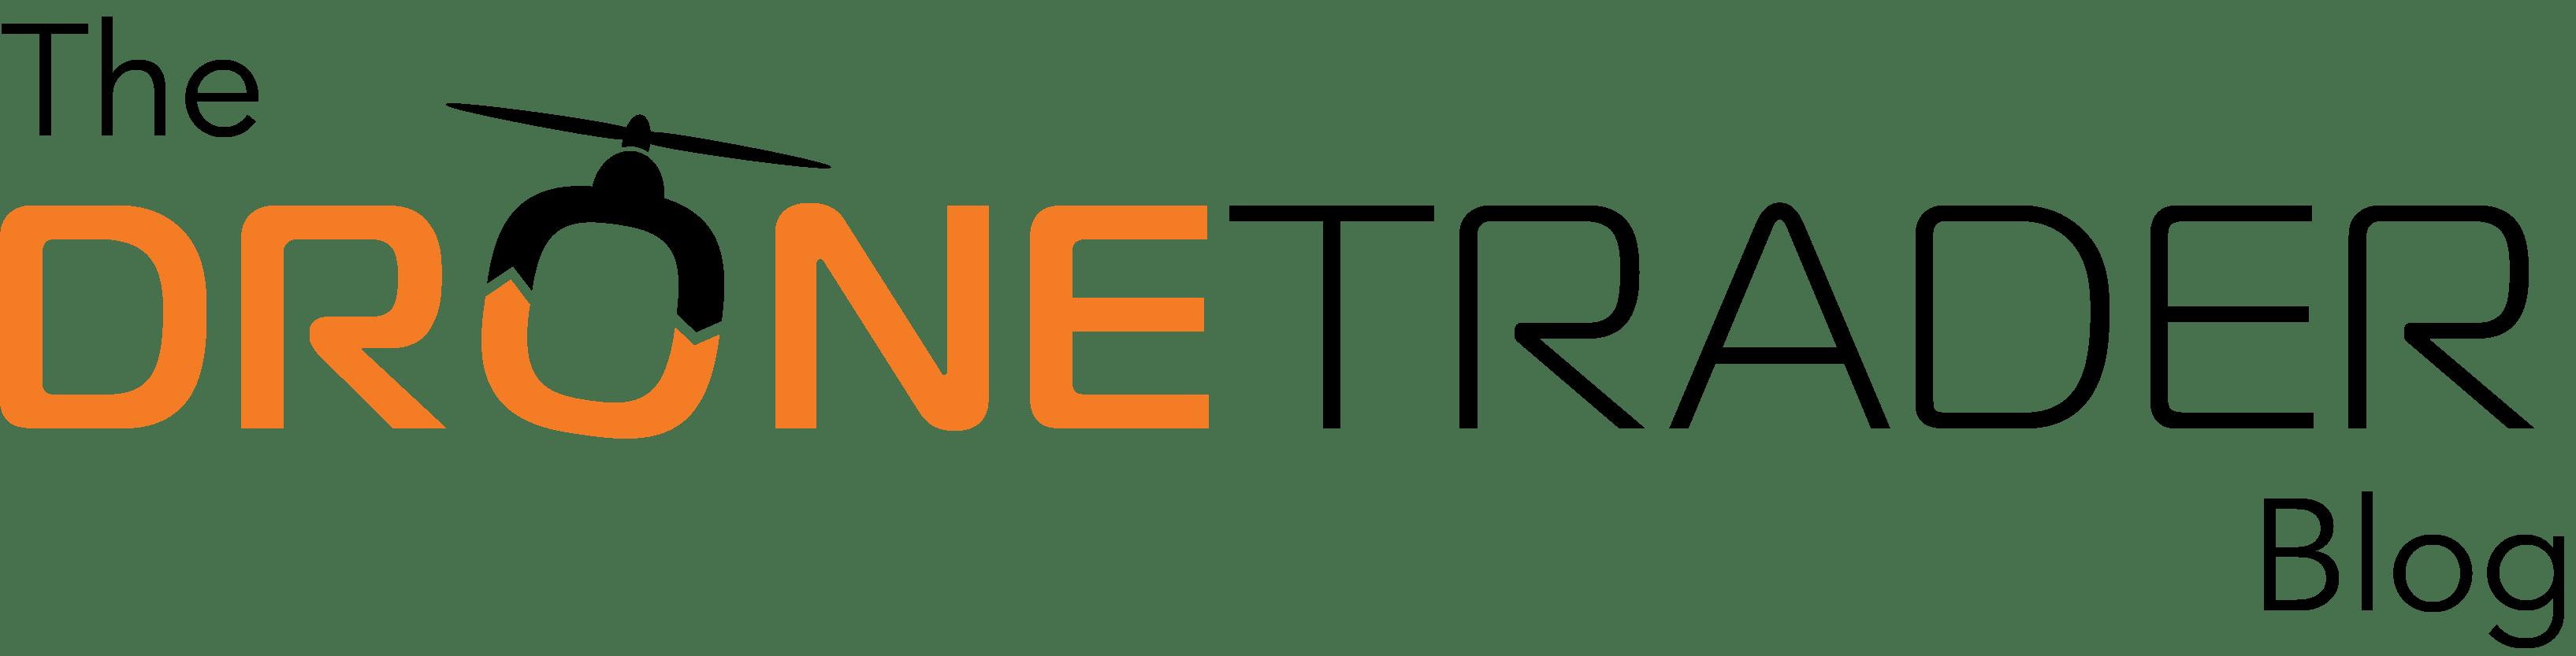 The DroneTrader Blog